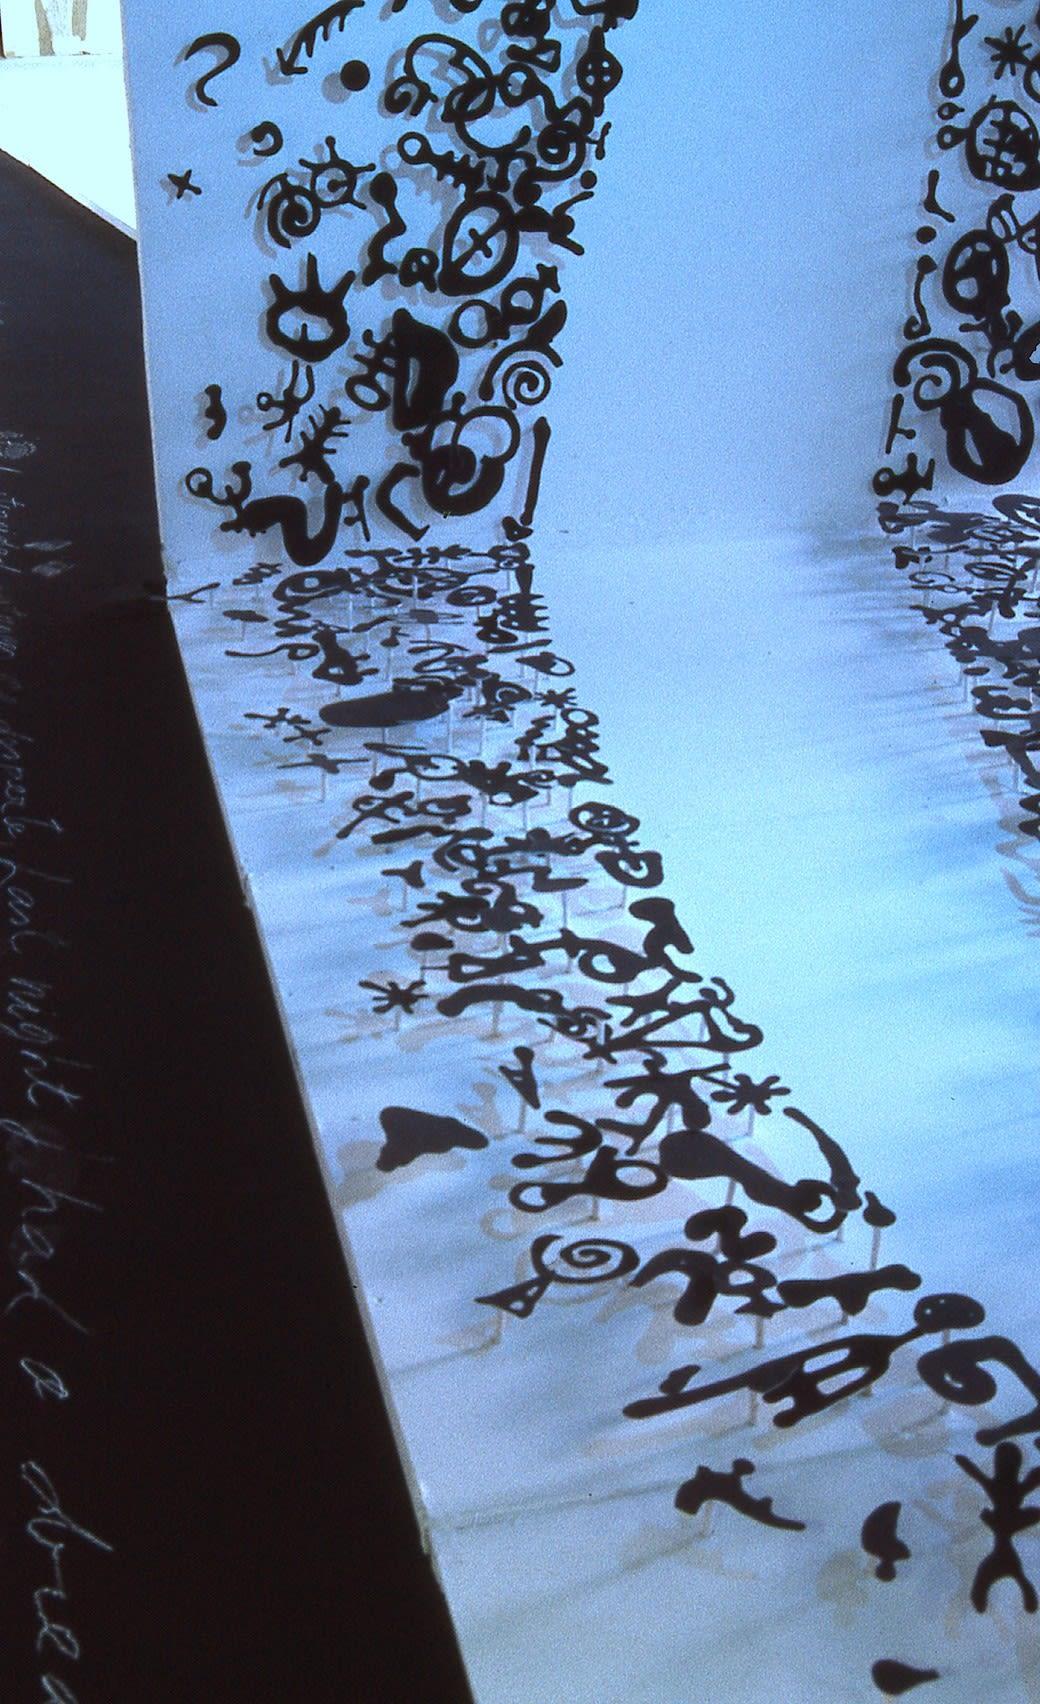 1999 Carlos Betancourt Departing Perspectives Exhibit00101